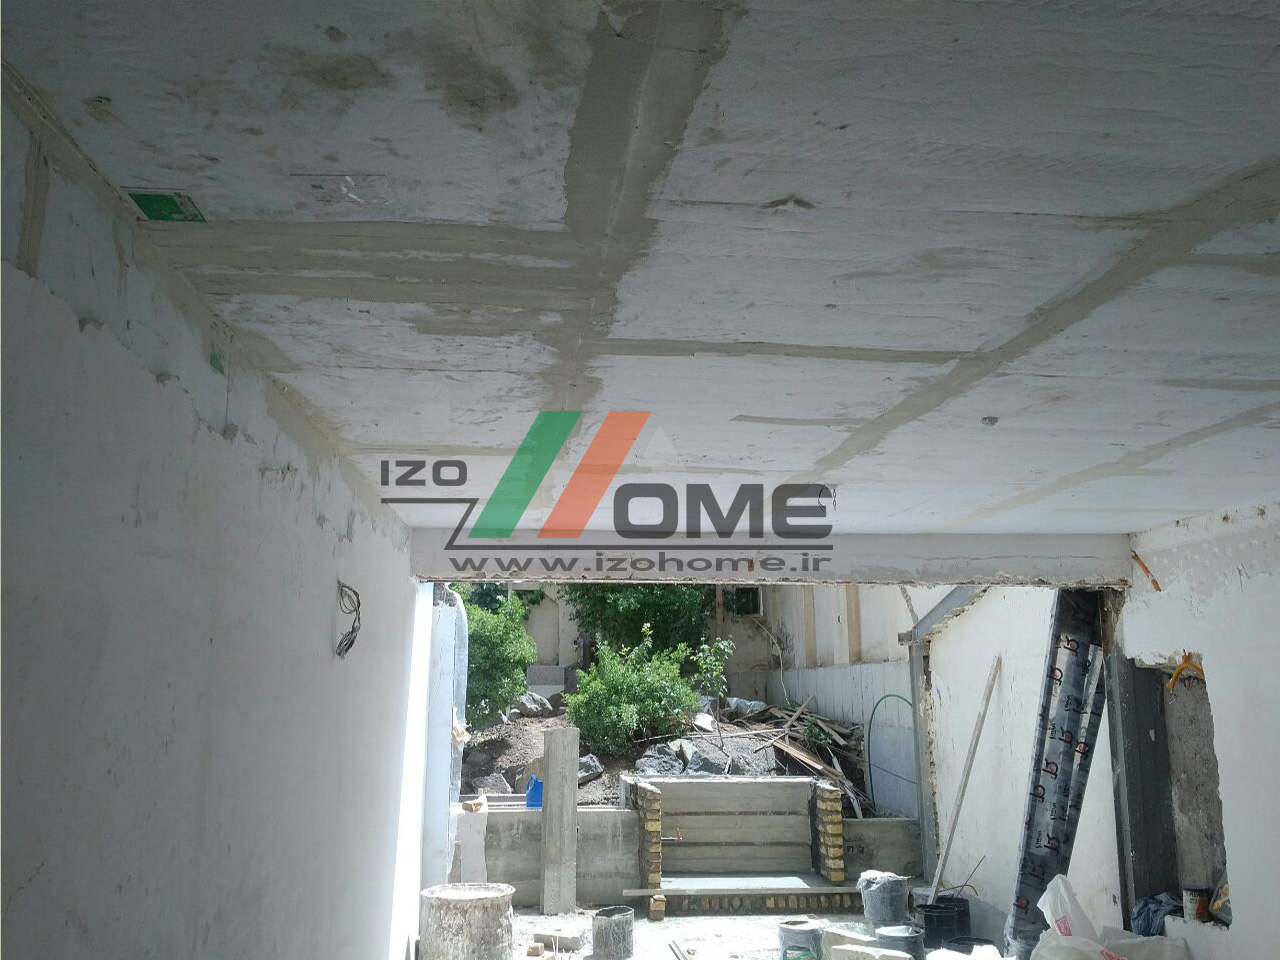 izohome45 - عایق صوتی برای سقف